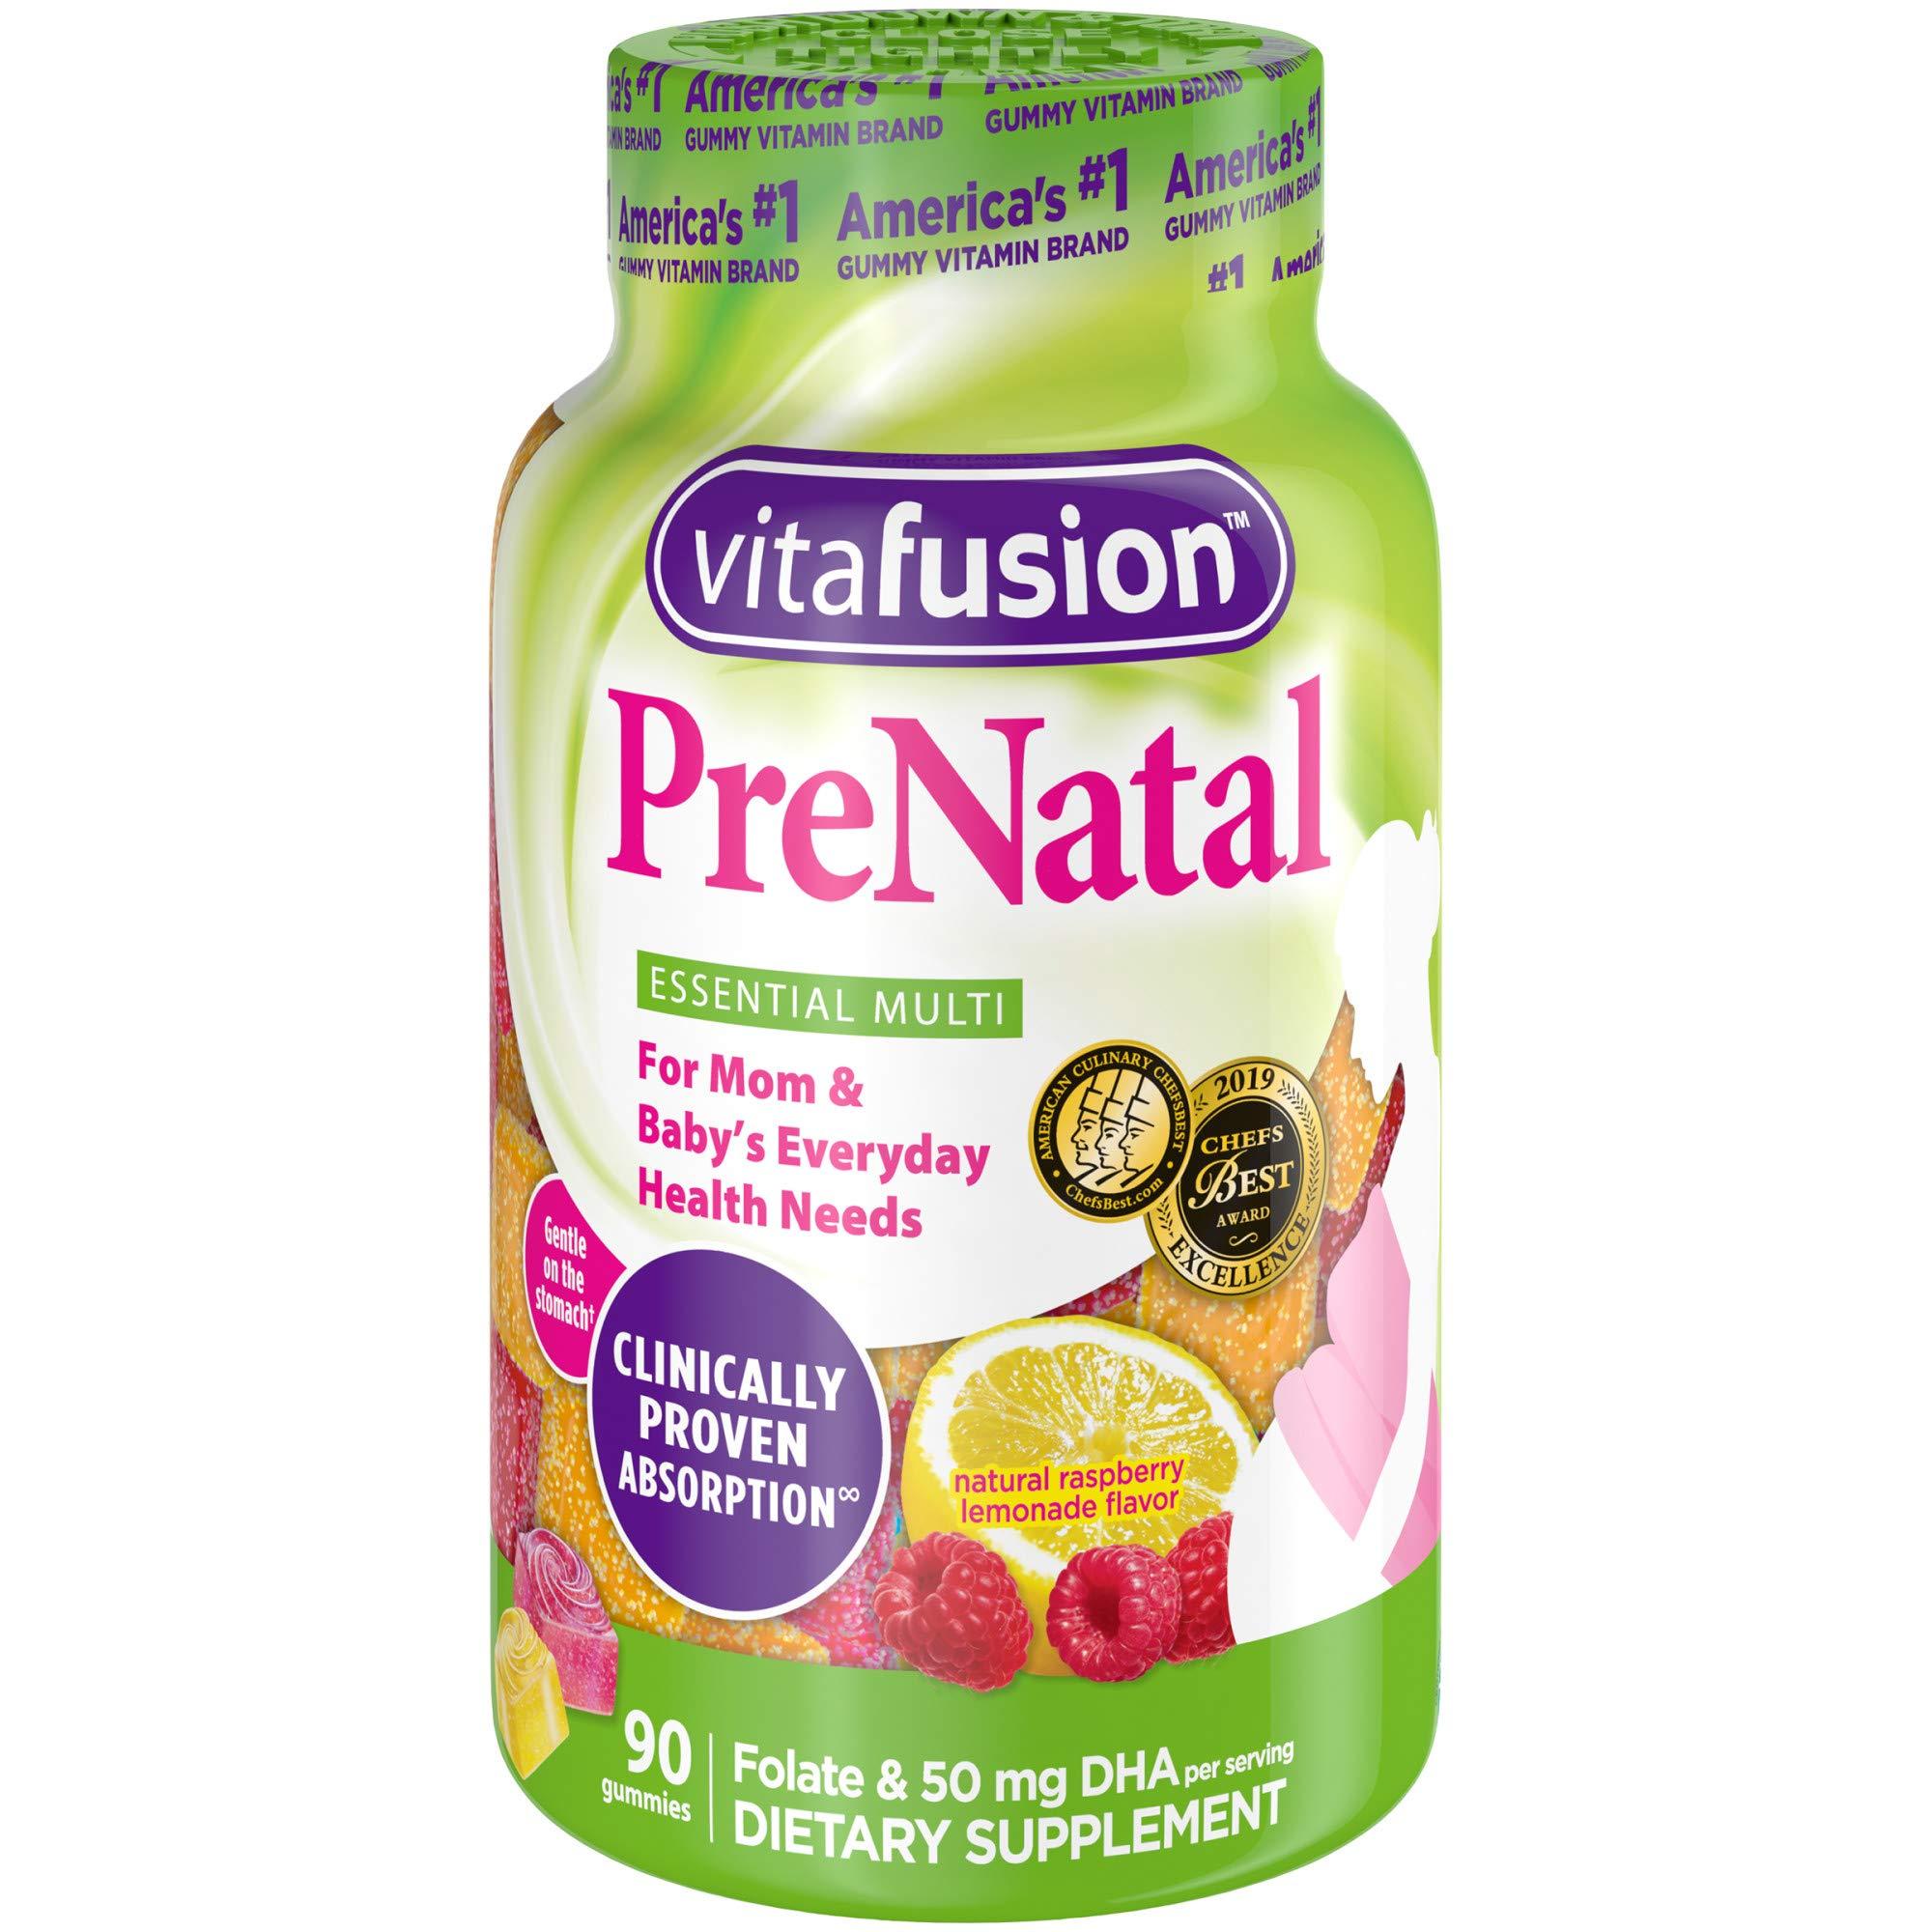 Vitafusion PreNatal Gummy Vitamins 90ct